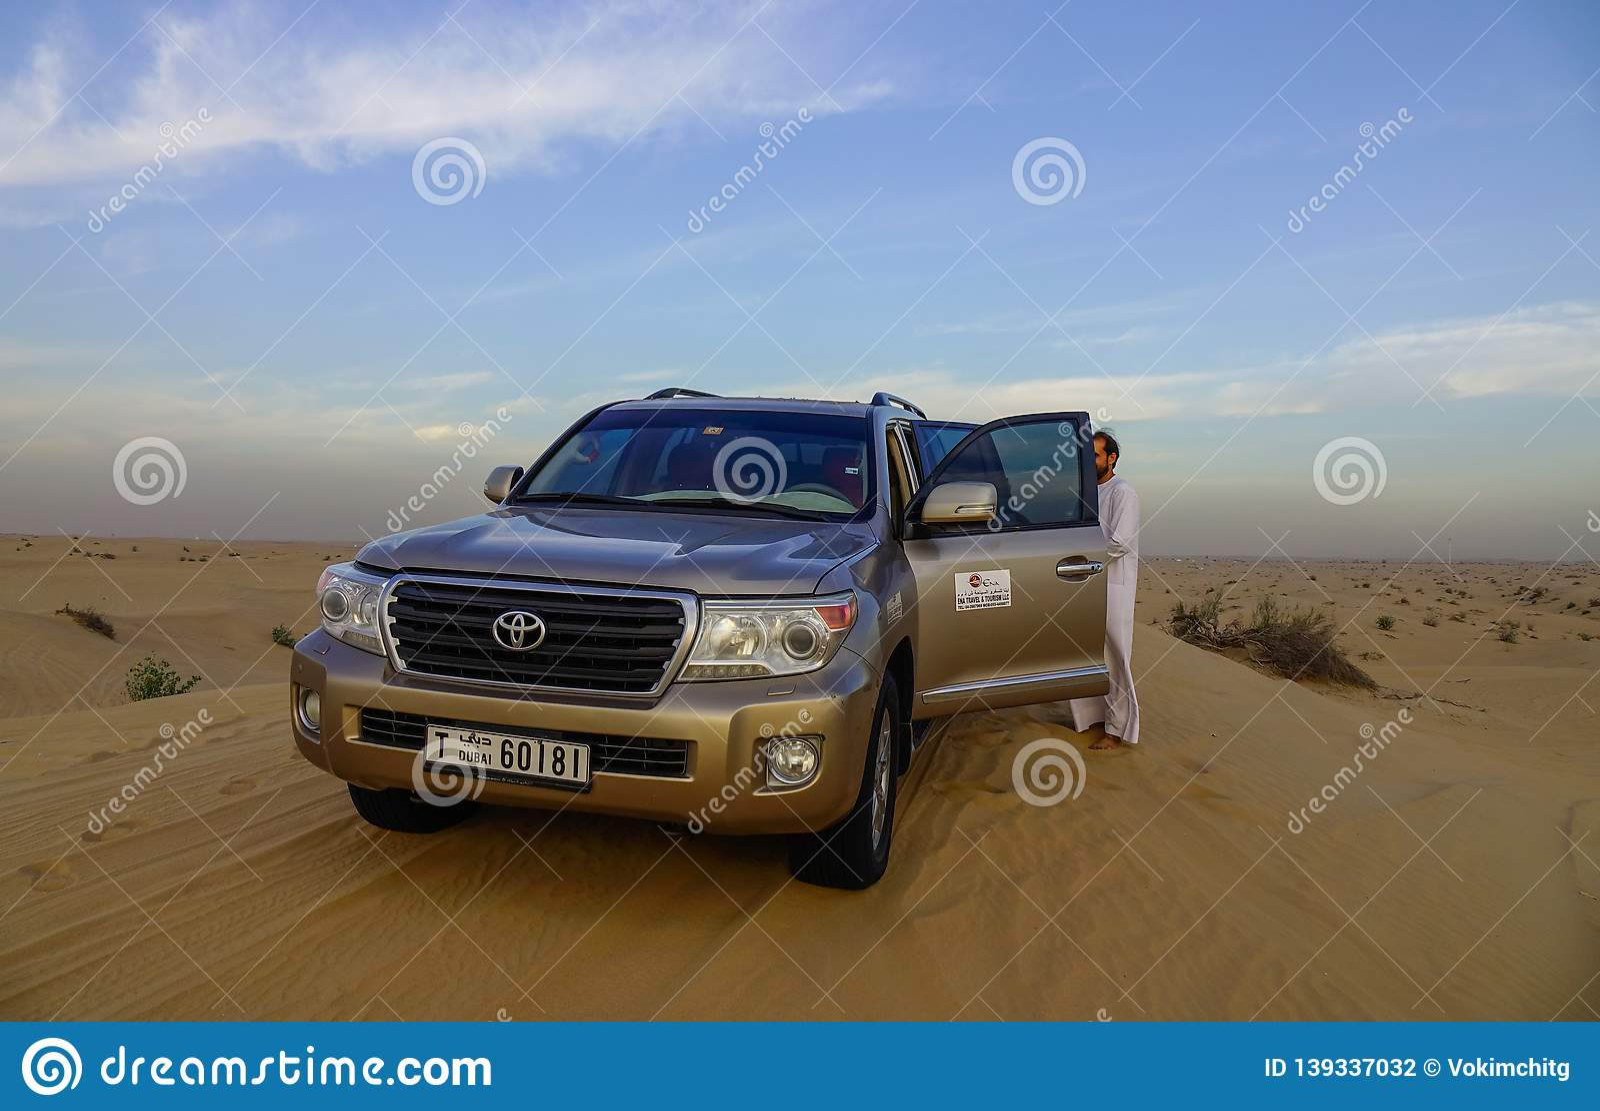 A Suv Car On Dubai Desert Editorial Photography Image Of Sport 139337032